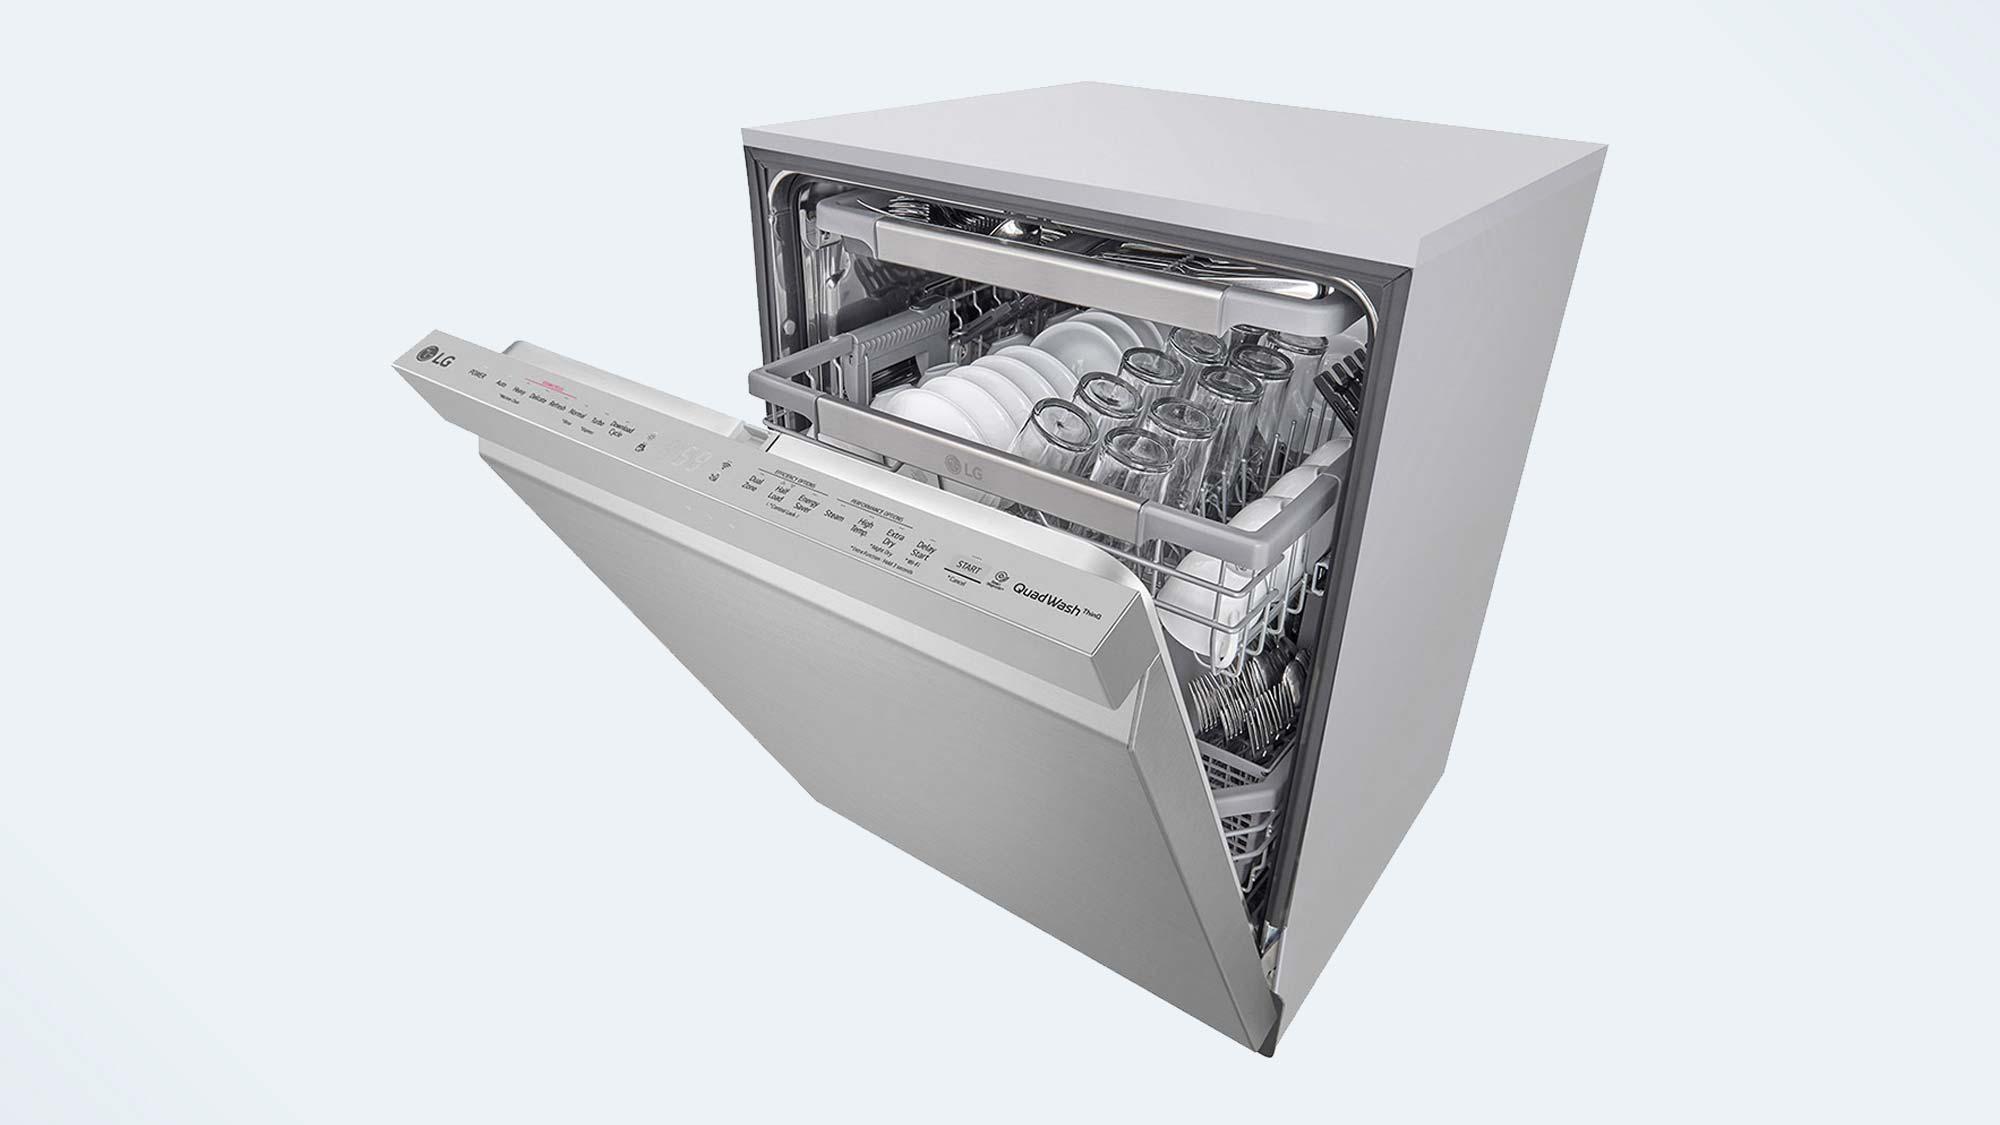 best dishwashers: LG LDP6810SS